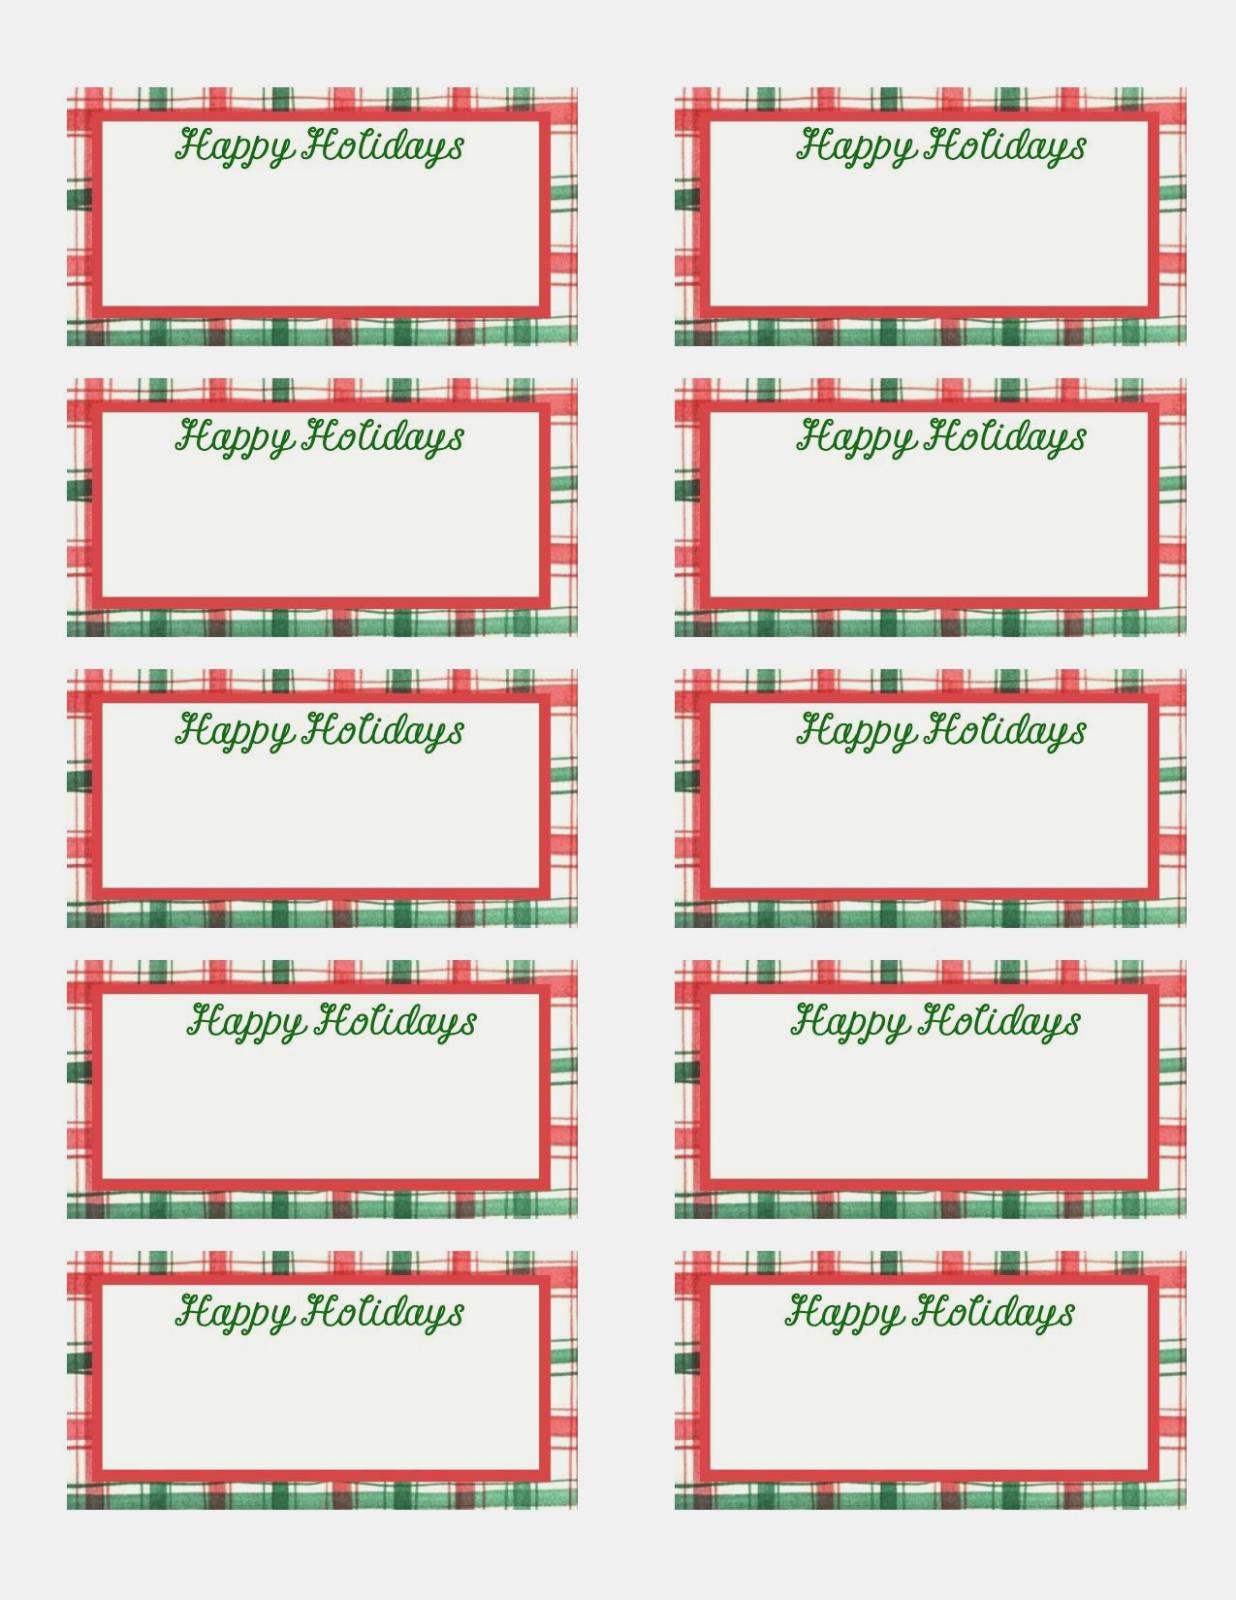 Blank Christmas Labels New Free Printable Editable Christmas T Tags - Free Printable Holiday Labels